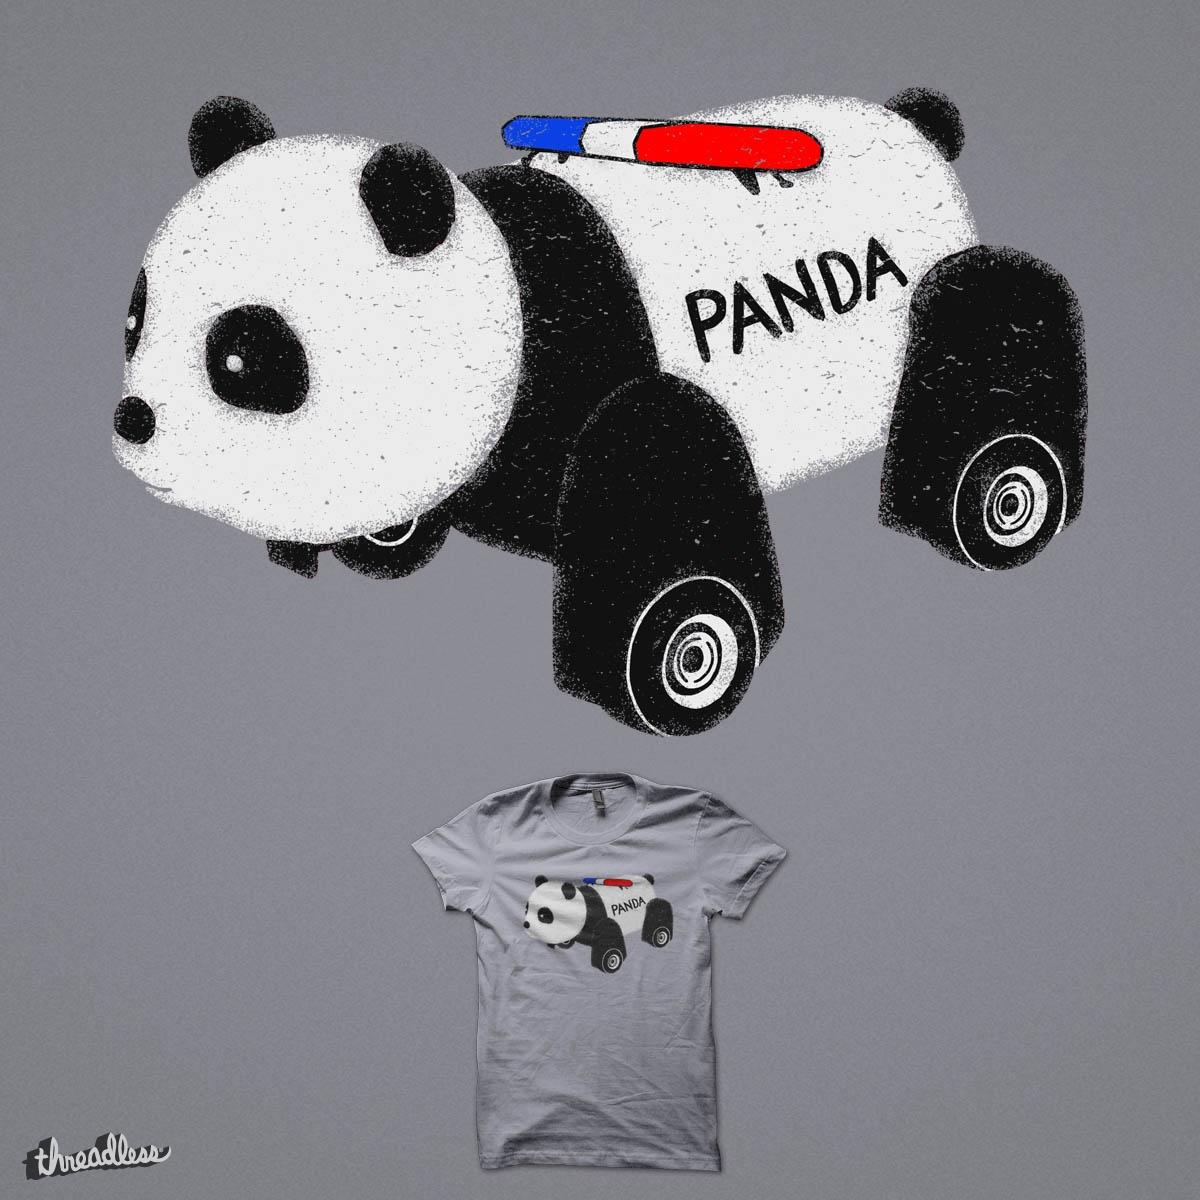 Panda Car by eikwox on Threadless